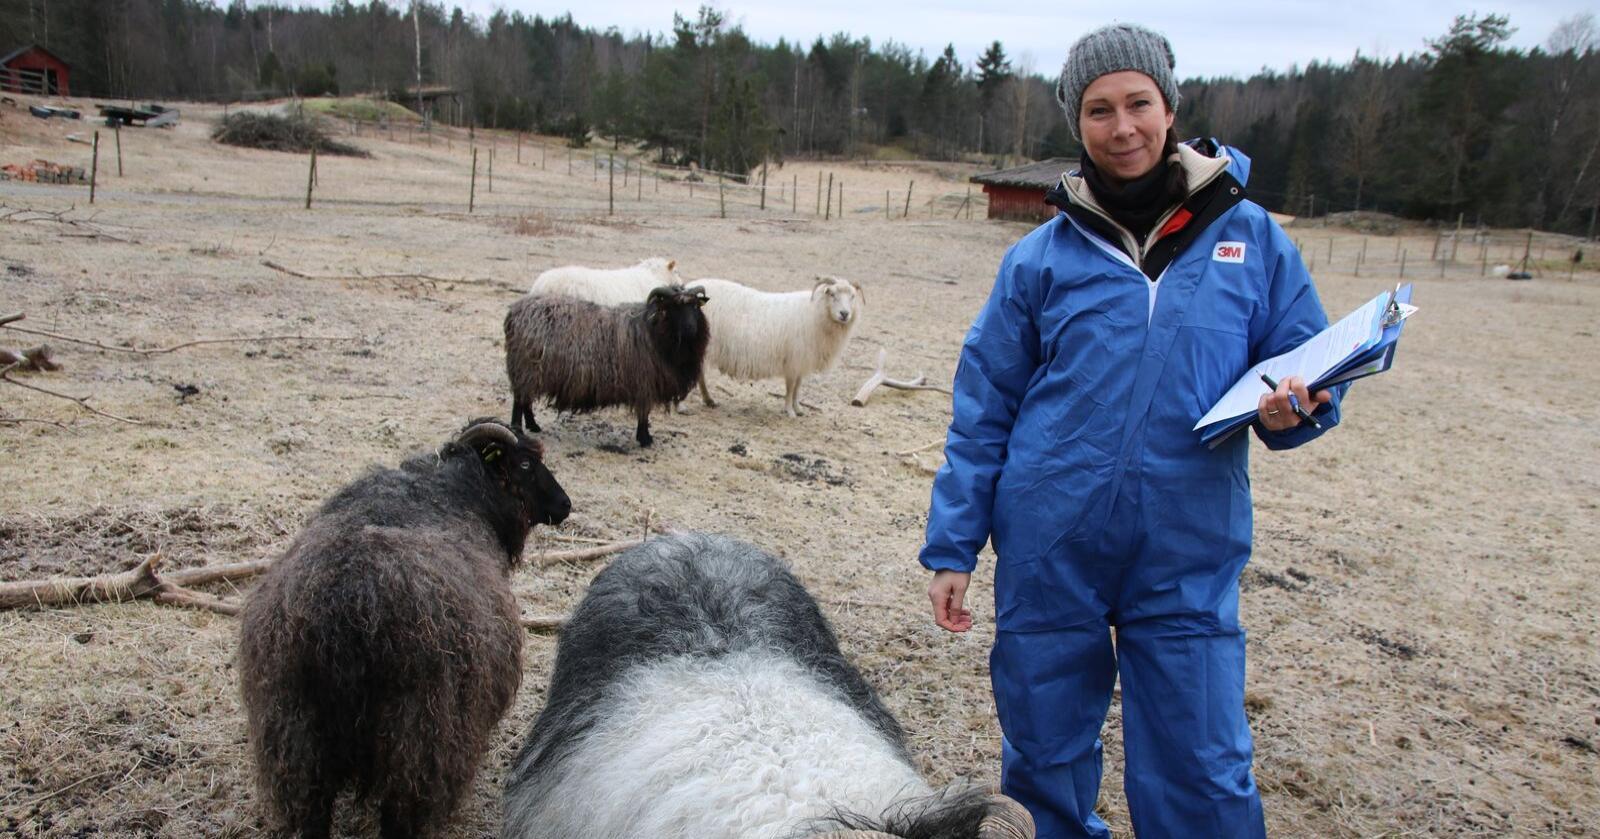 Veterinær i Mattilsynet i Østfold og Follo, Henriette Hjersing, på skrapesyketilsyn på Skuterud gård. Foto: Knut Houge